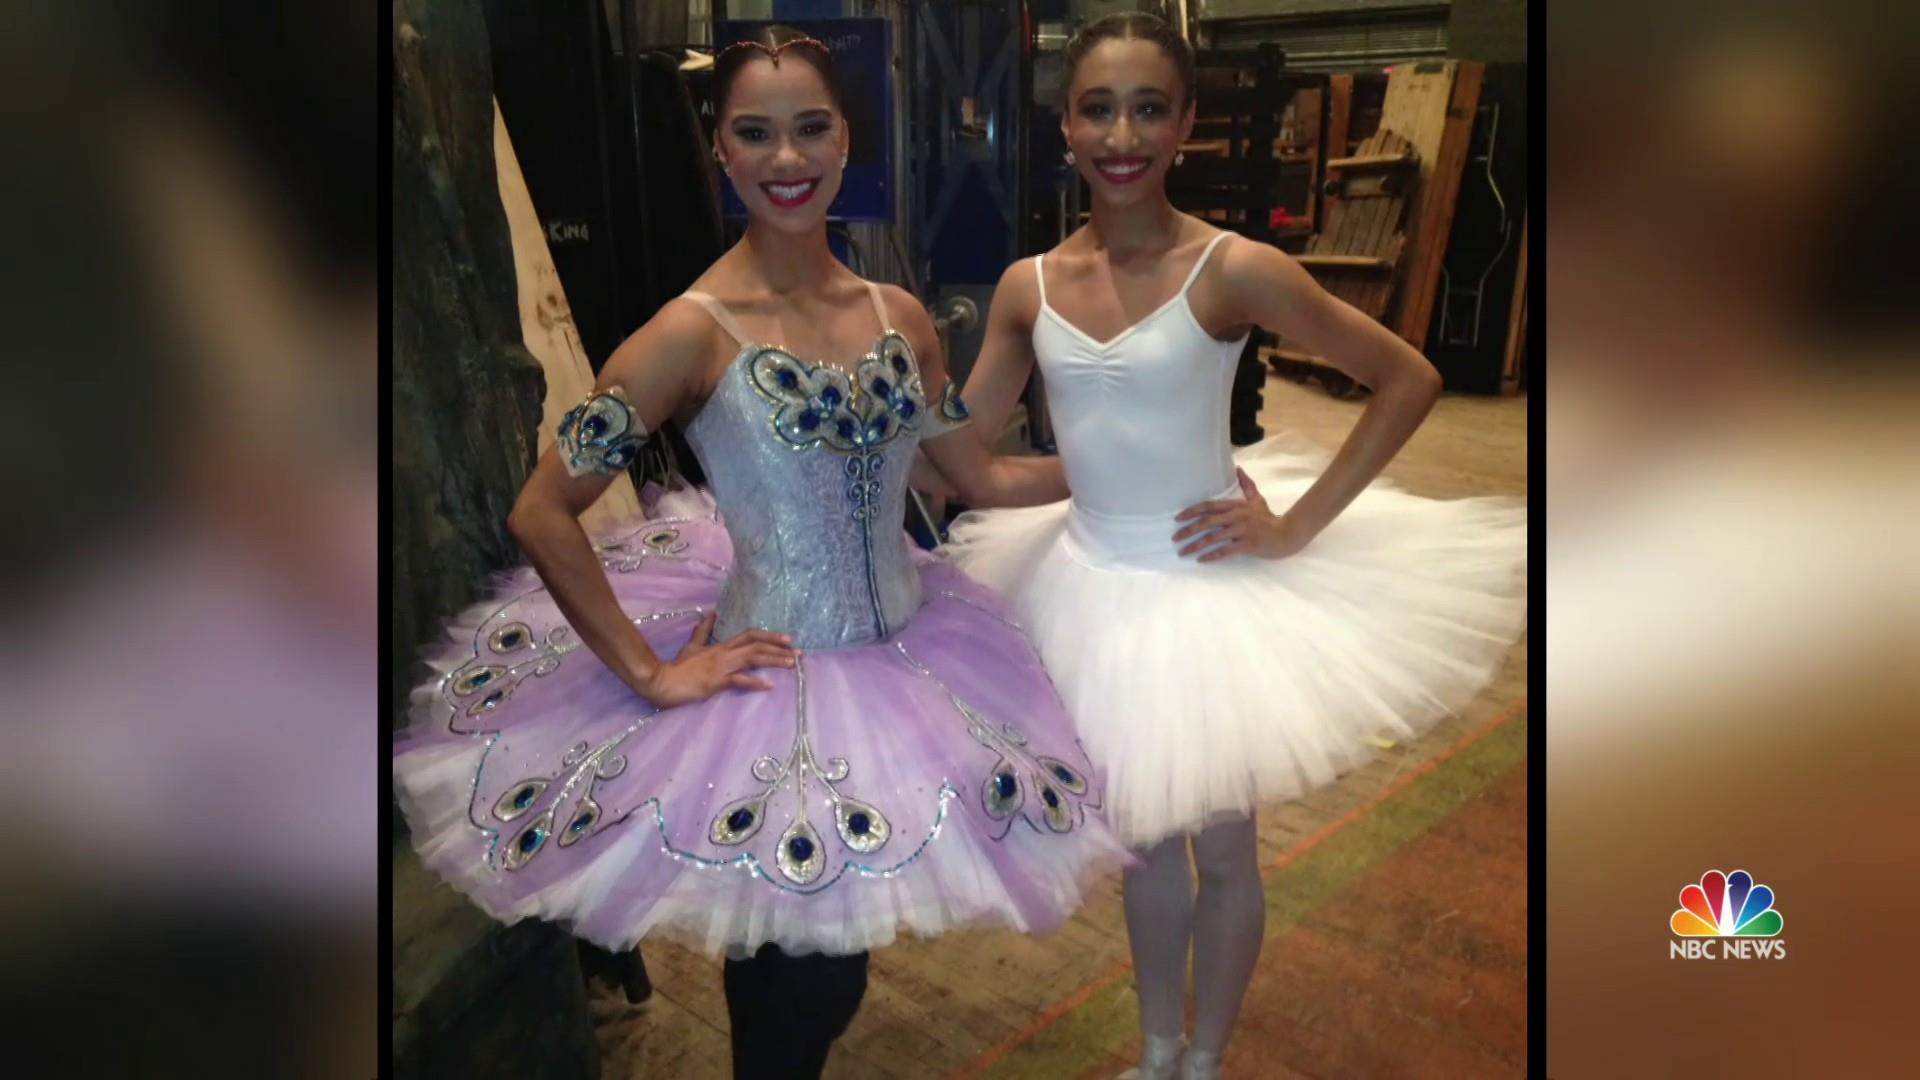 Black Dancers Inspiring The Next Generation 2/25/21